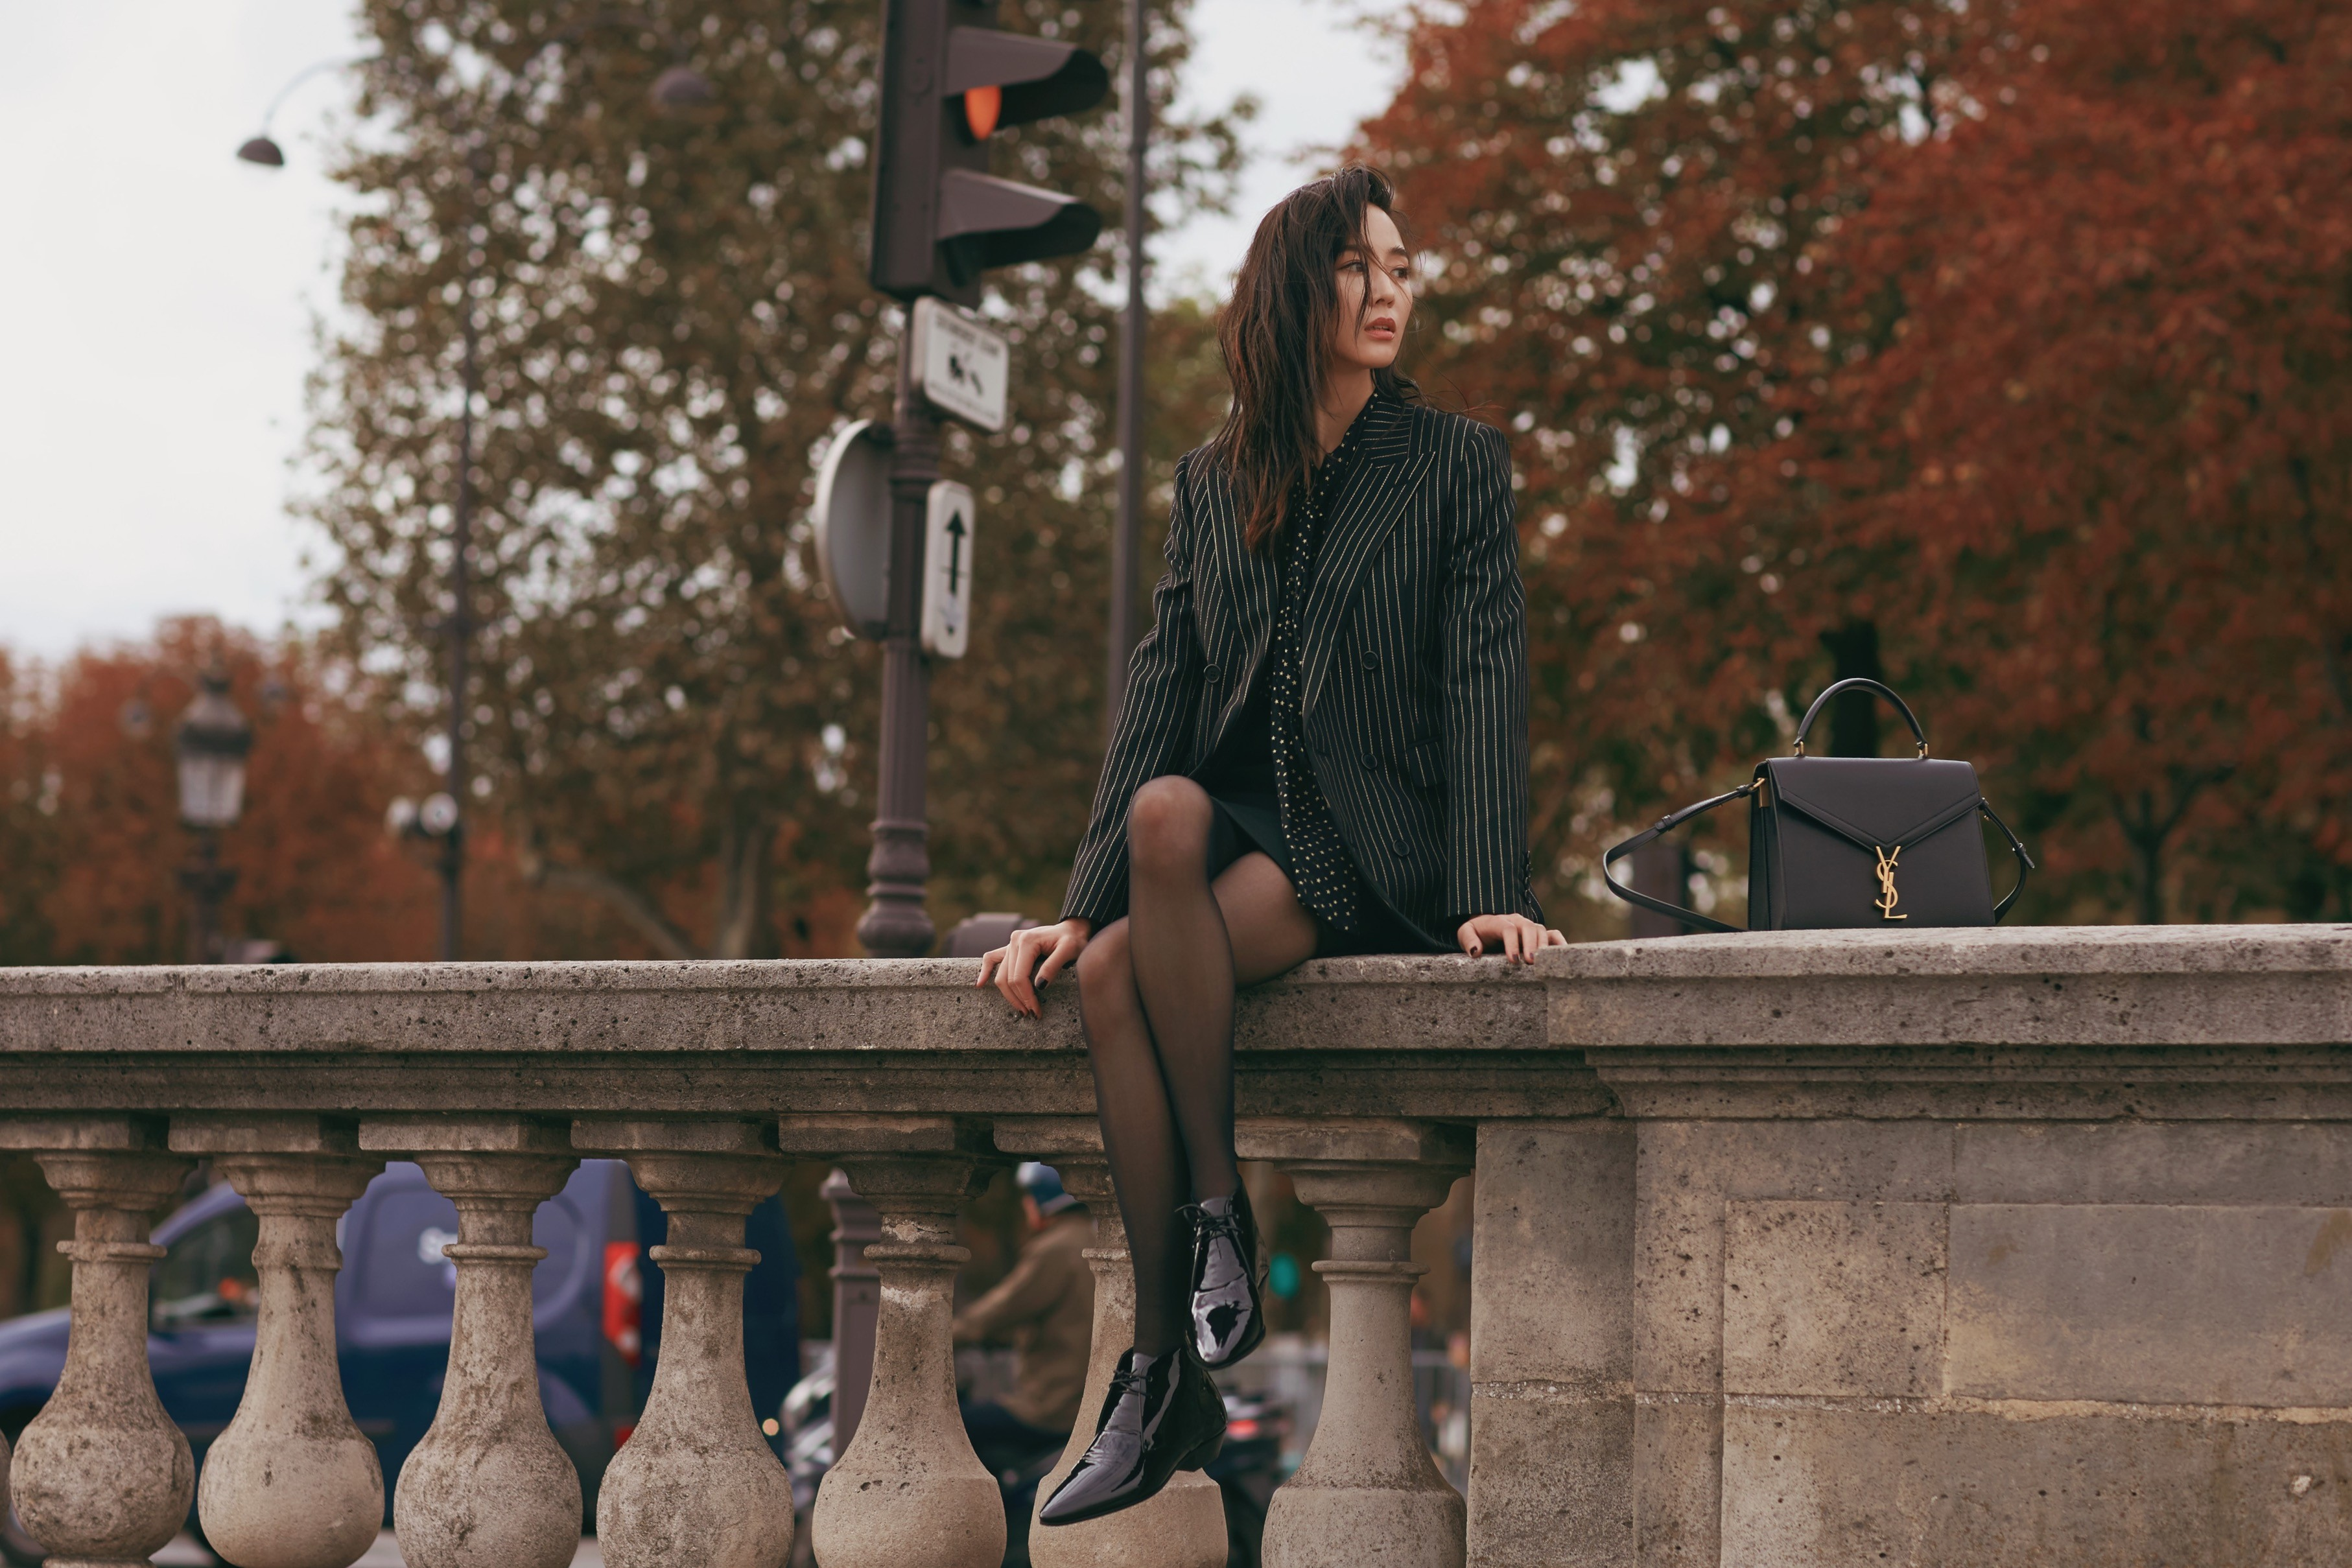 巴黎时装周/张钧甯SAINT LAURENT街拍